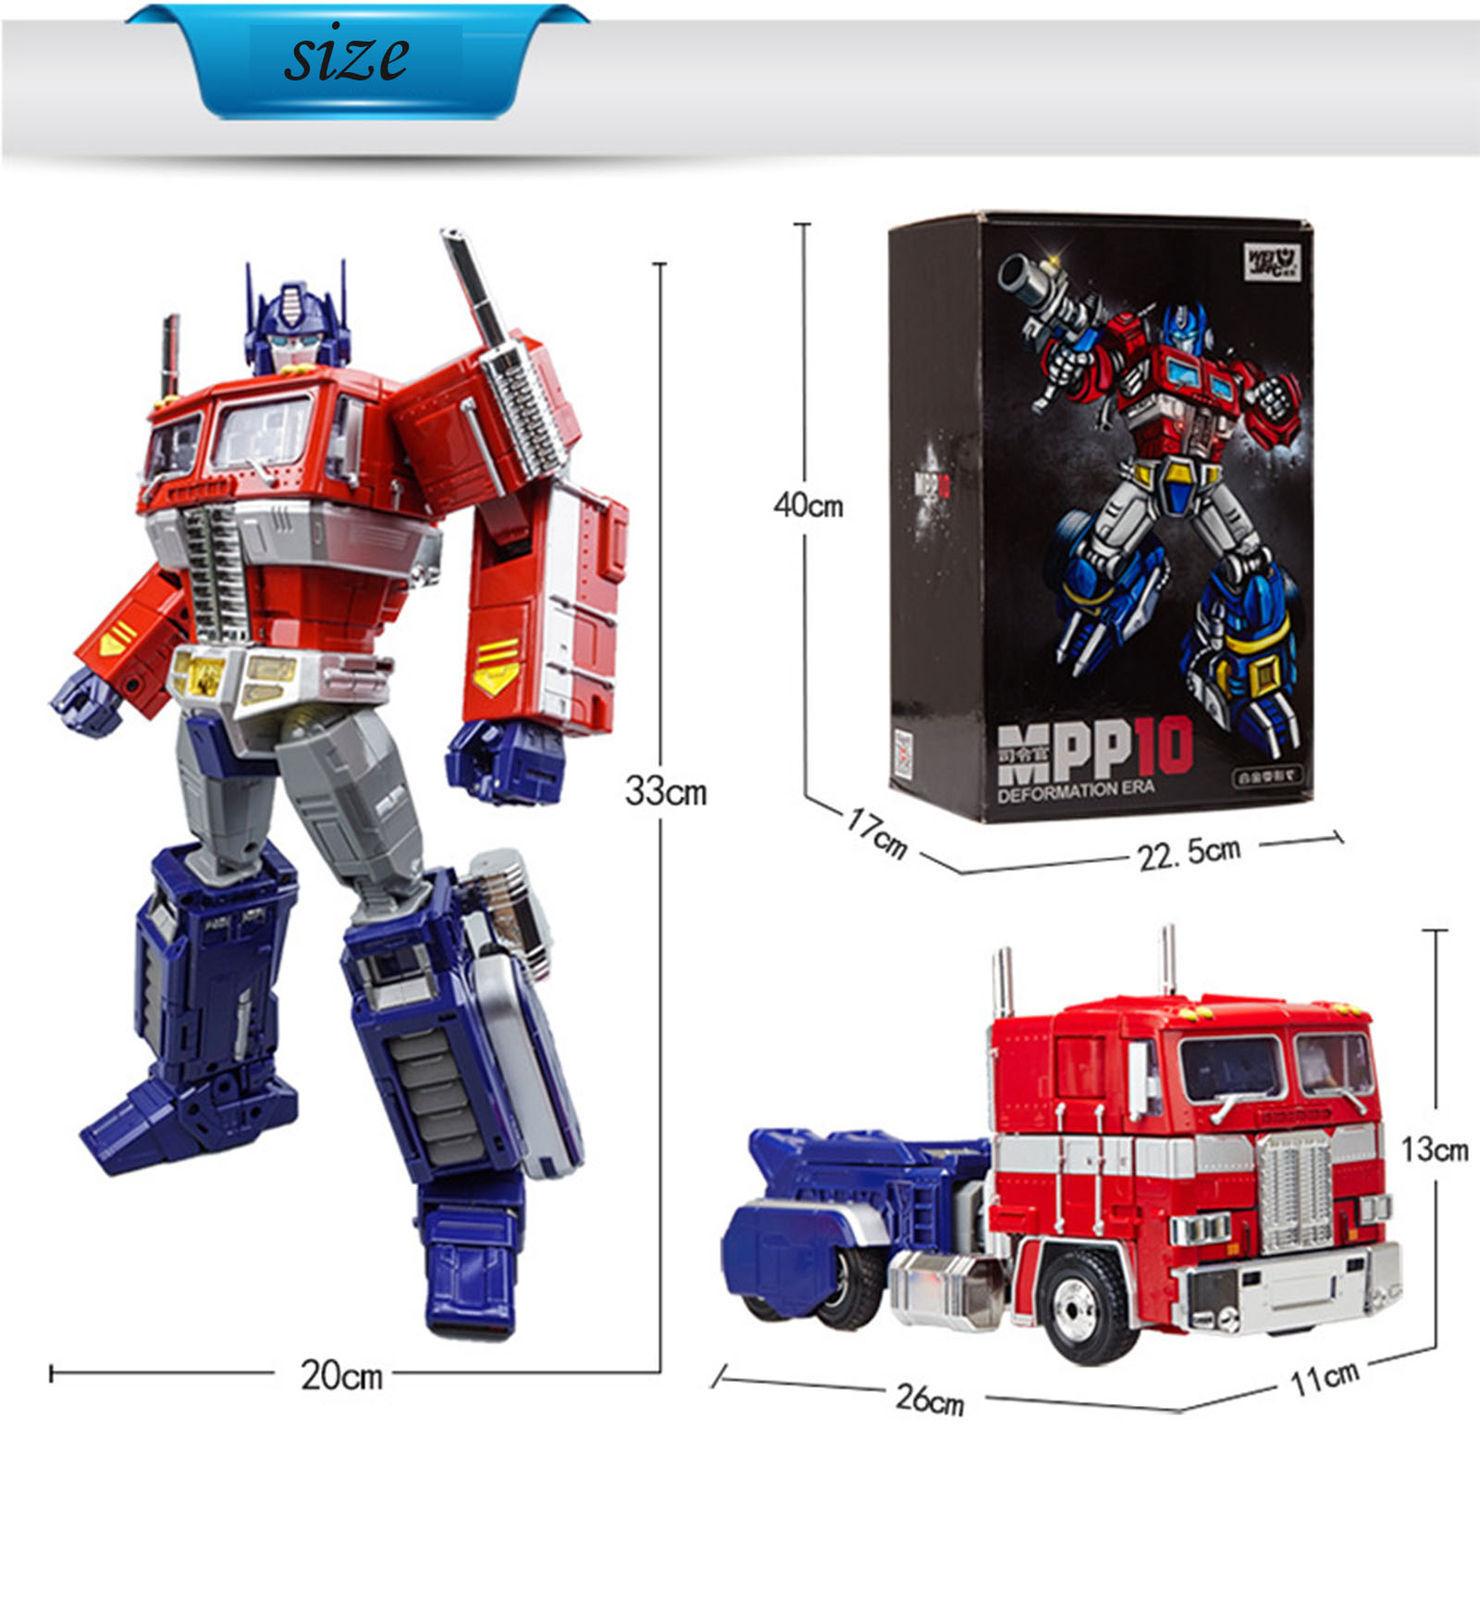 New MPP10 WEIJIANG Transformers Optimus Prime Deformation Era Gift Toy